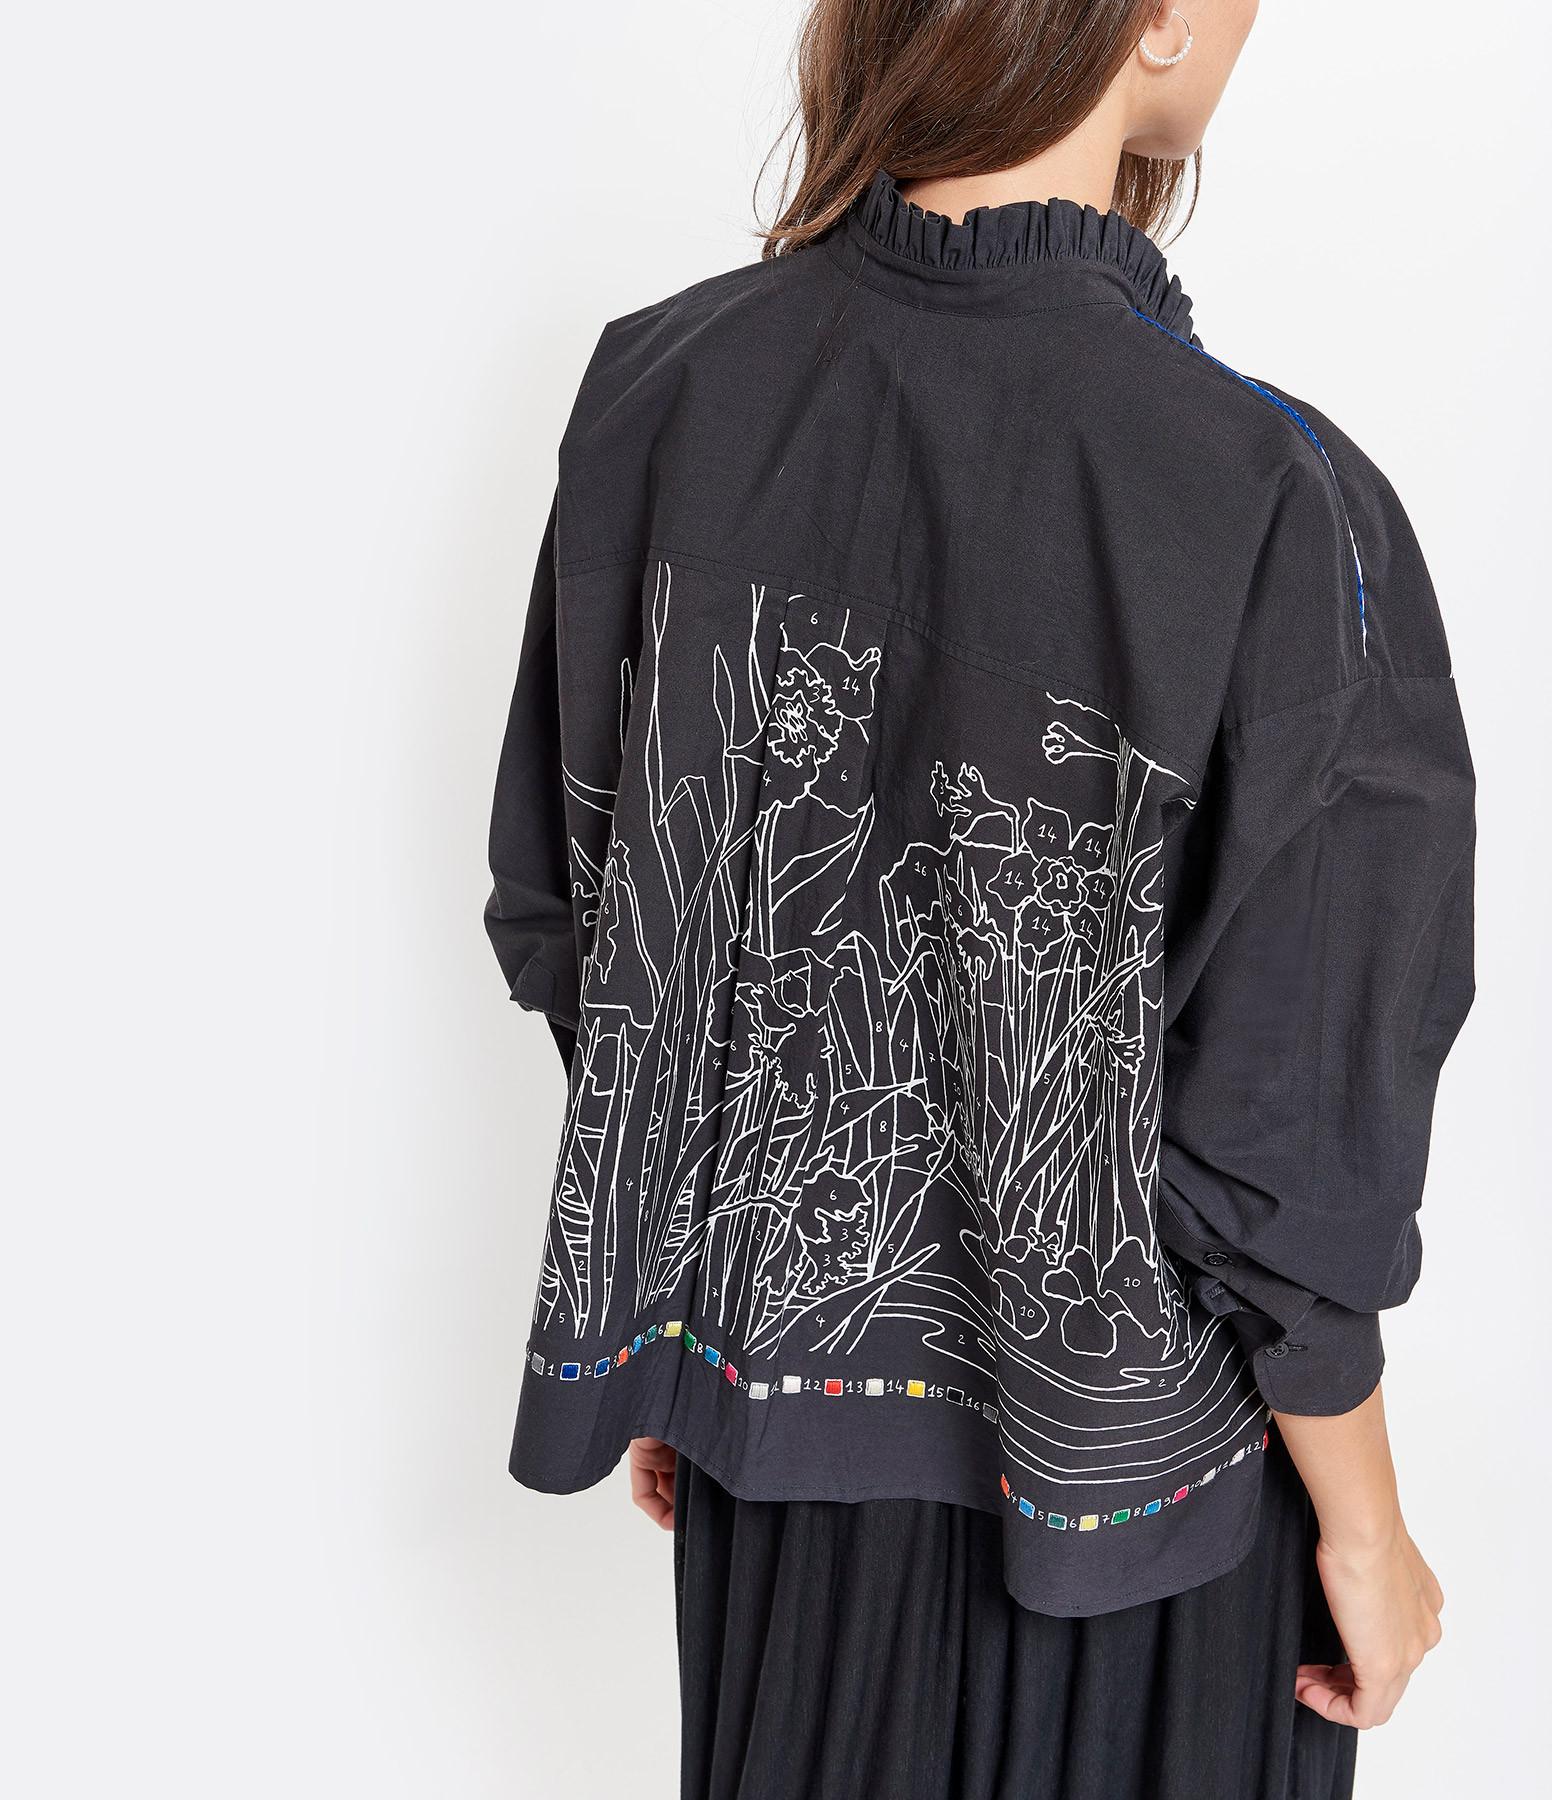 MII - Blouse Broderies Coton Noir